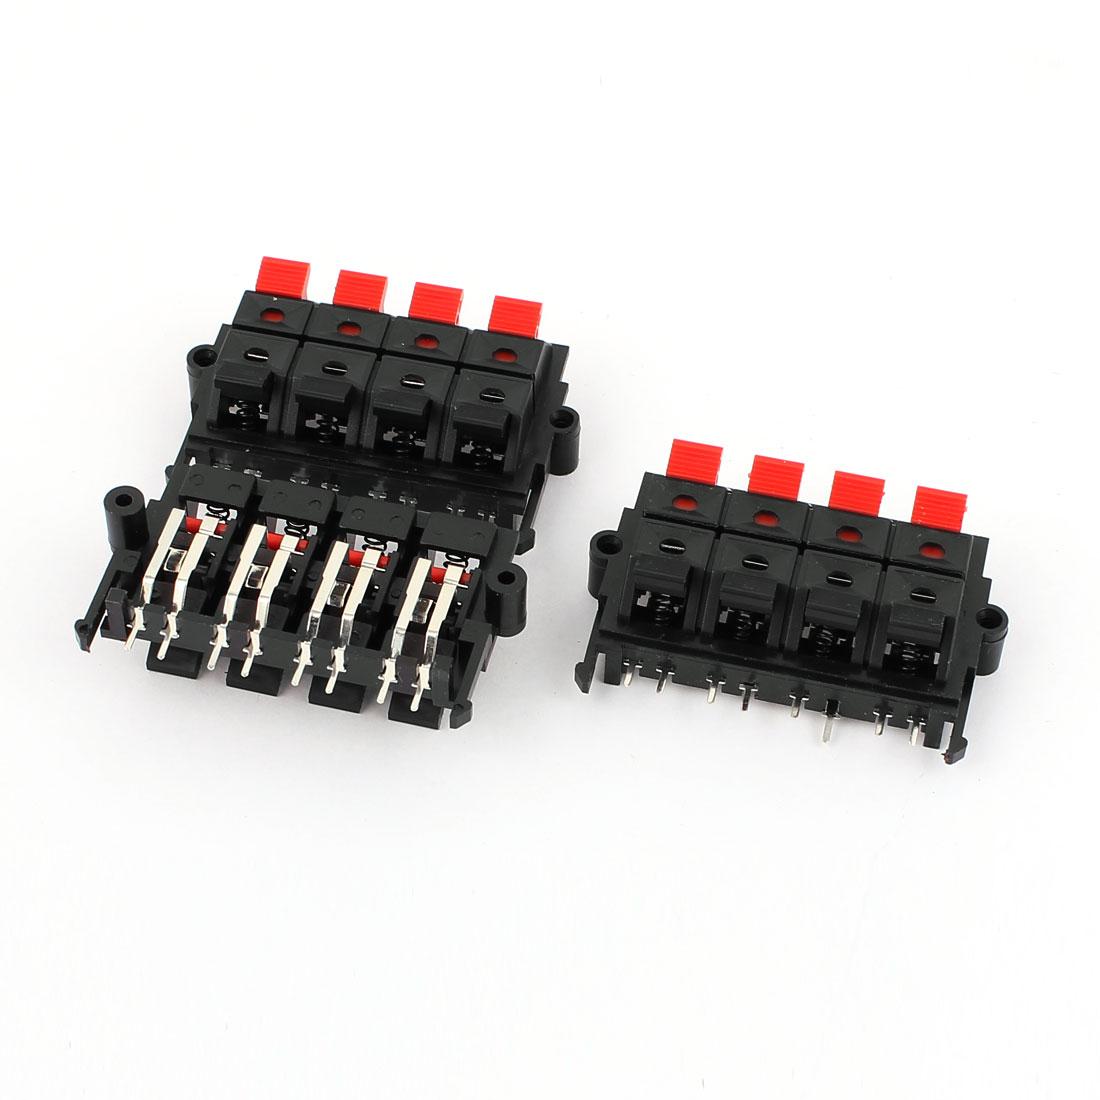 3Pcs 8 Way Jack Socket Spring Push Release Connector Speaker Terminal Block